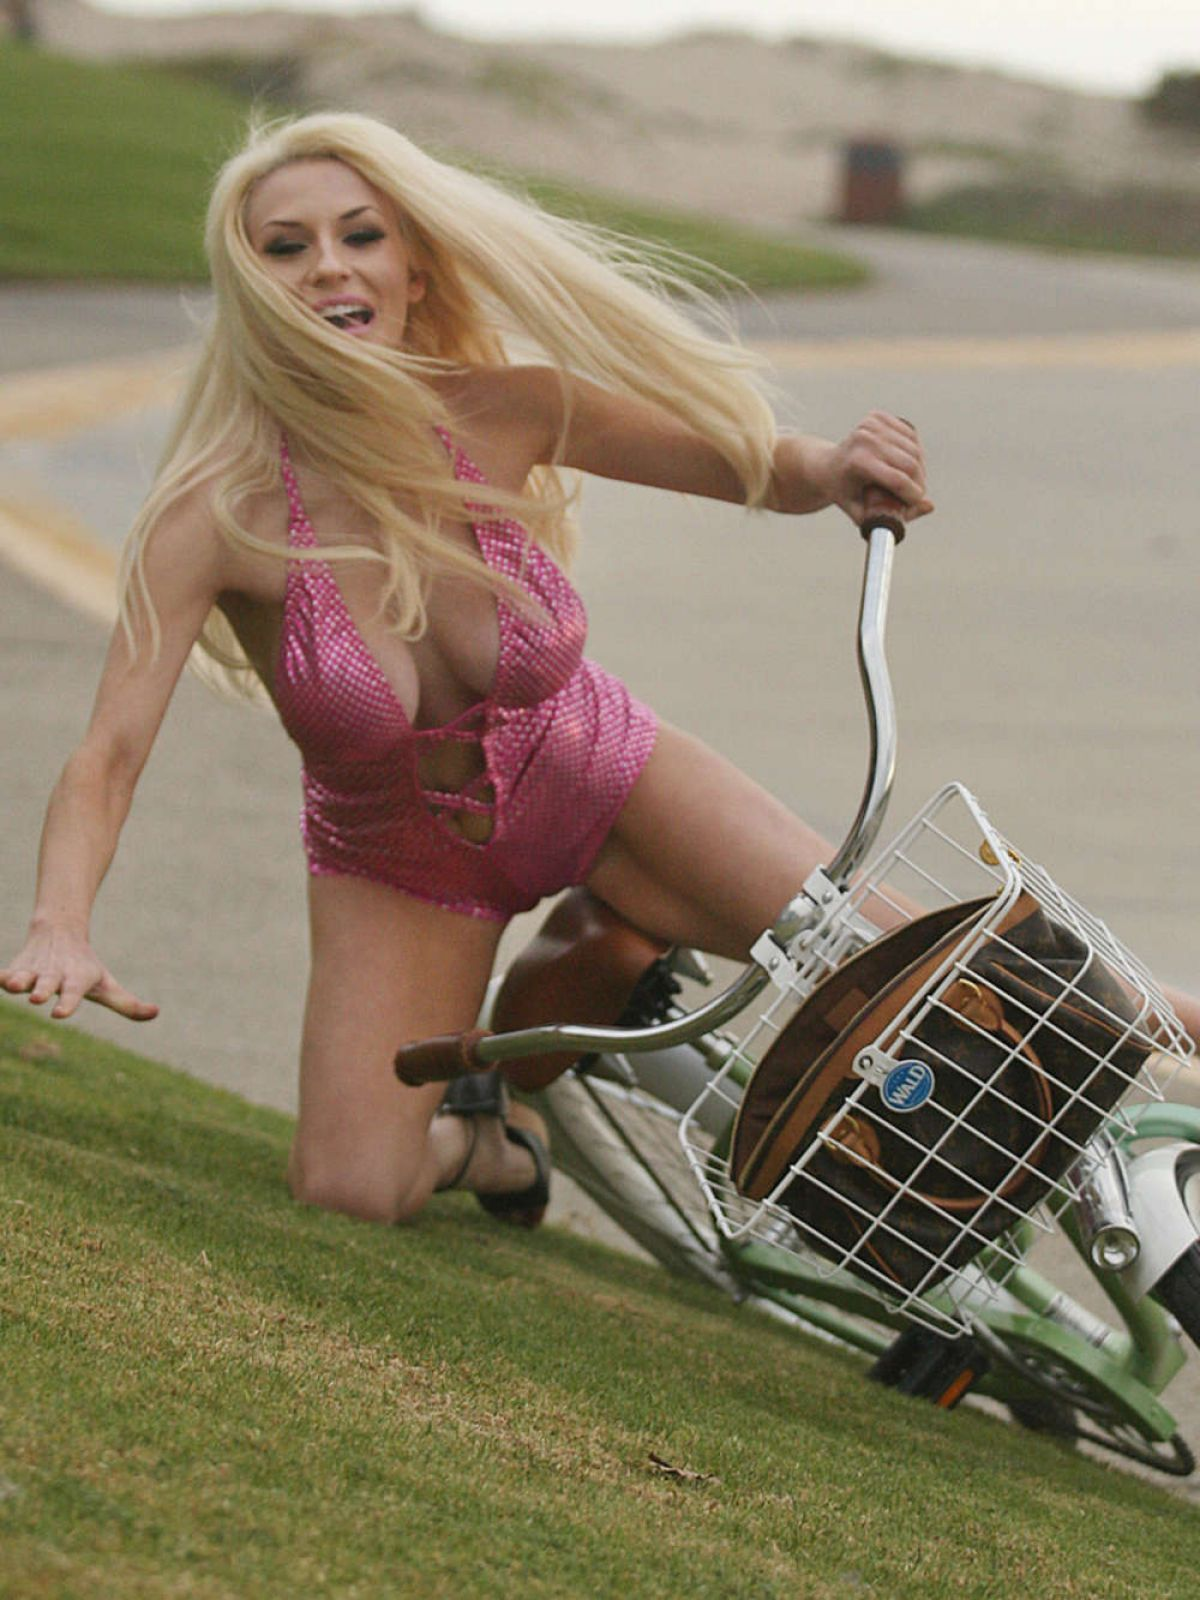 ourtney-stodden-falls-off-her-bike-in-los-angeles_13.jpg